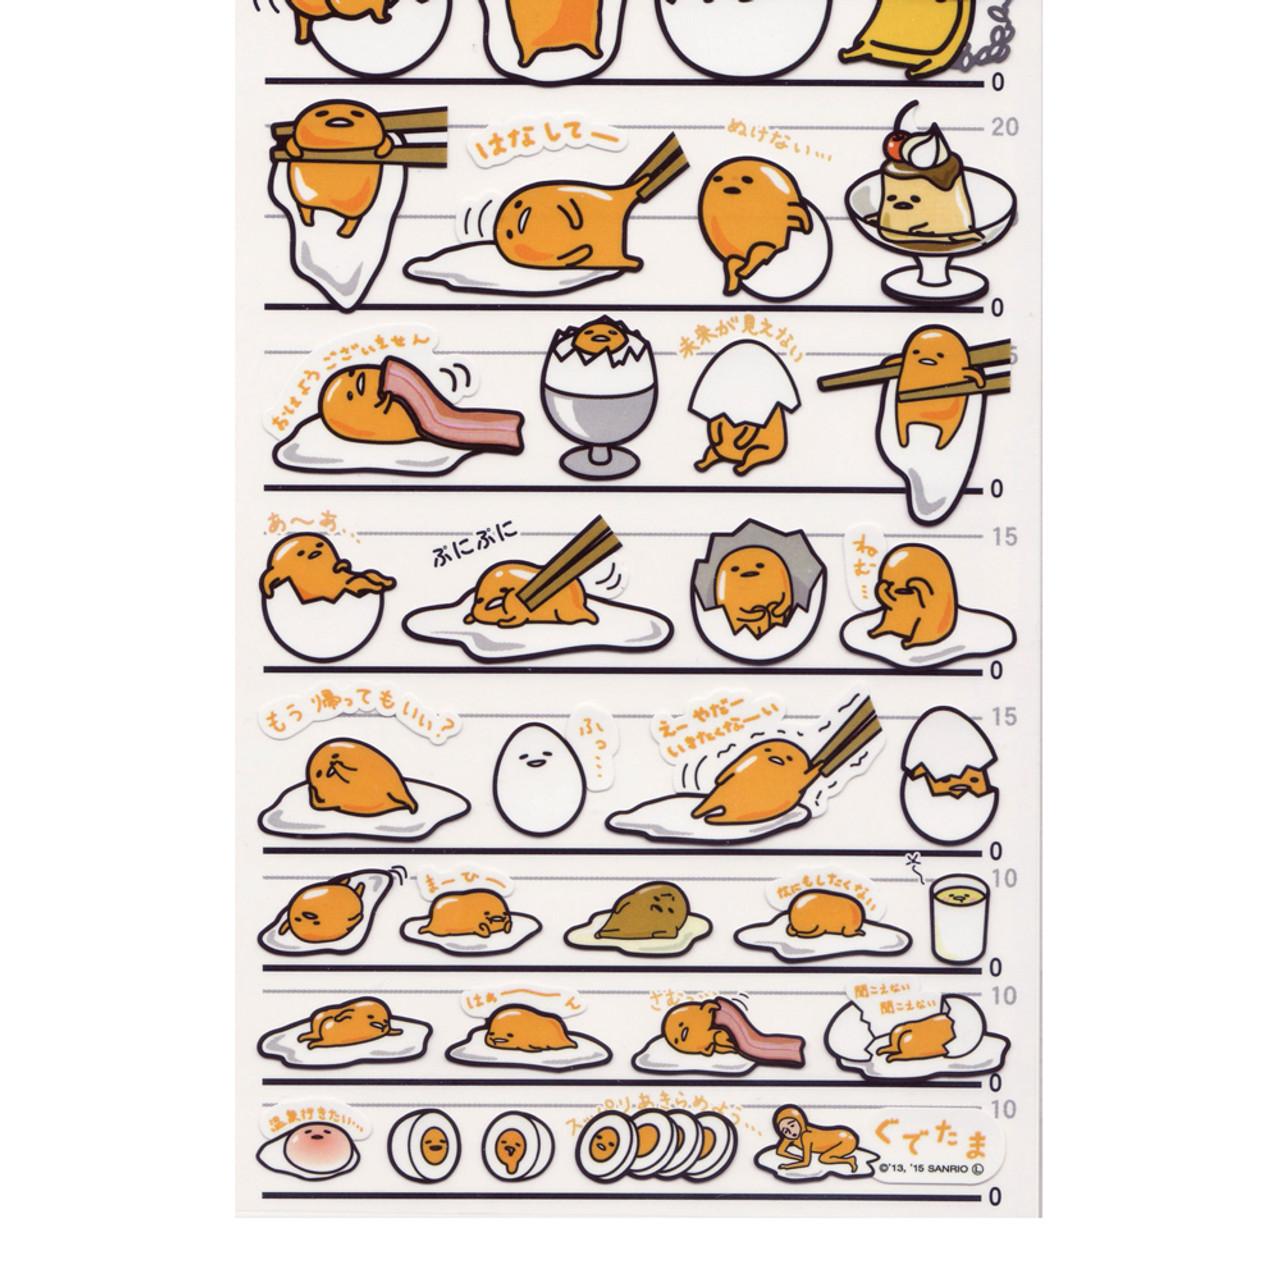 Sanrio Gudetama Lazy Egg Breakfast Series Stationery 4 Size Sticker ( Close Up Bottom )